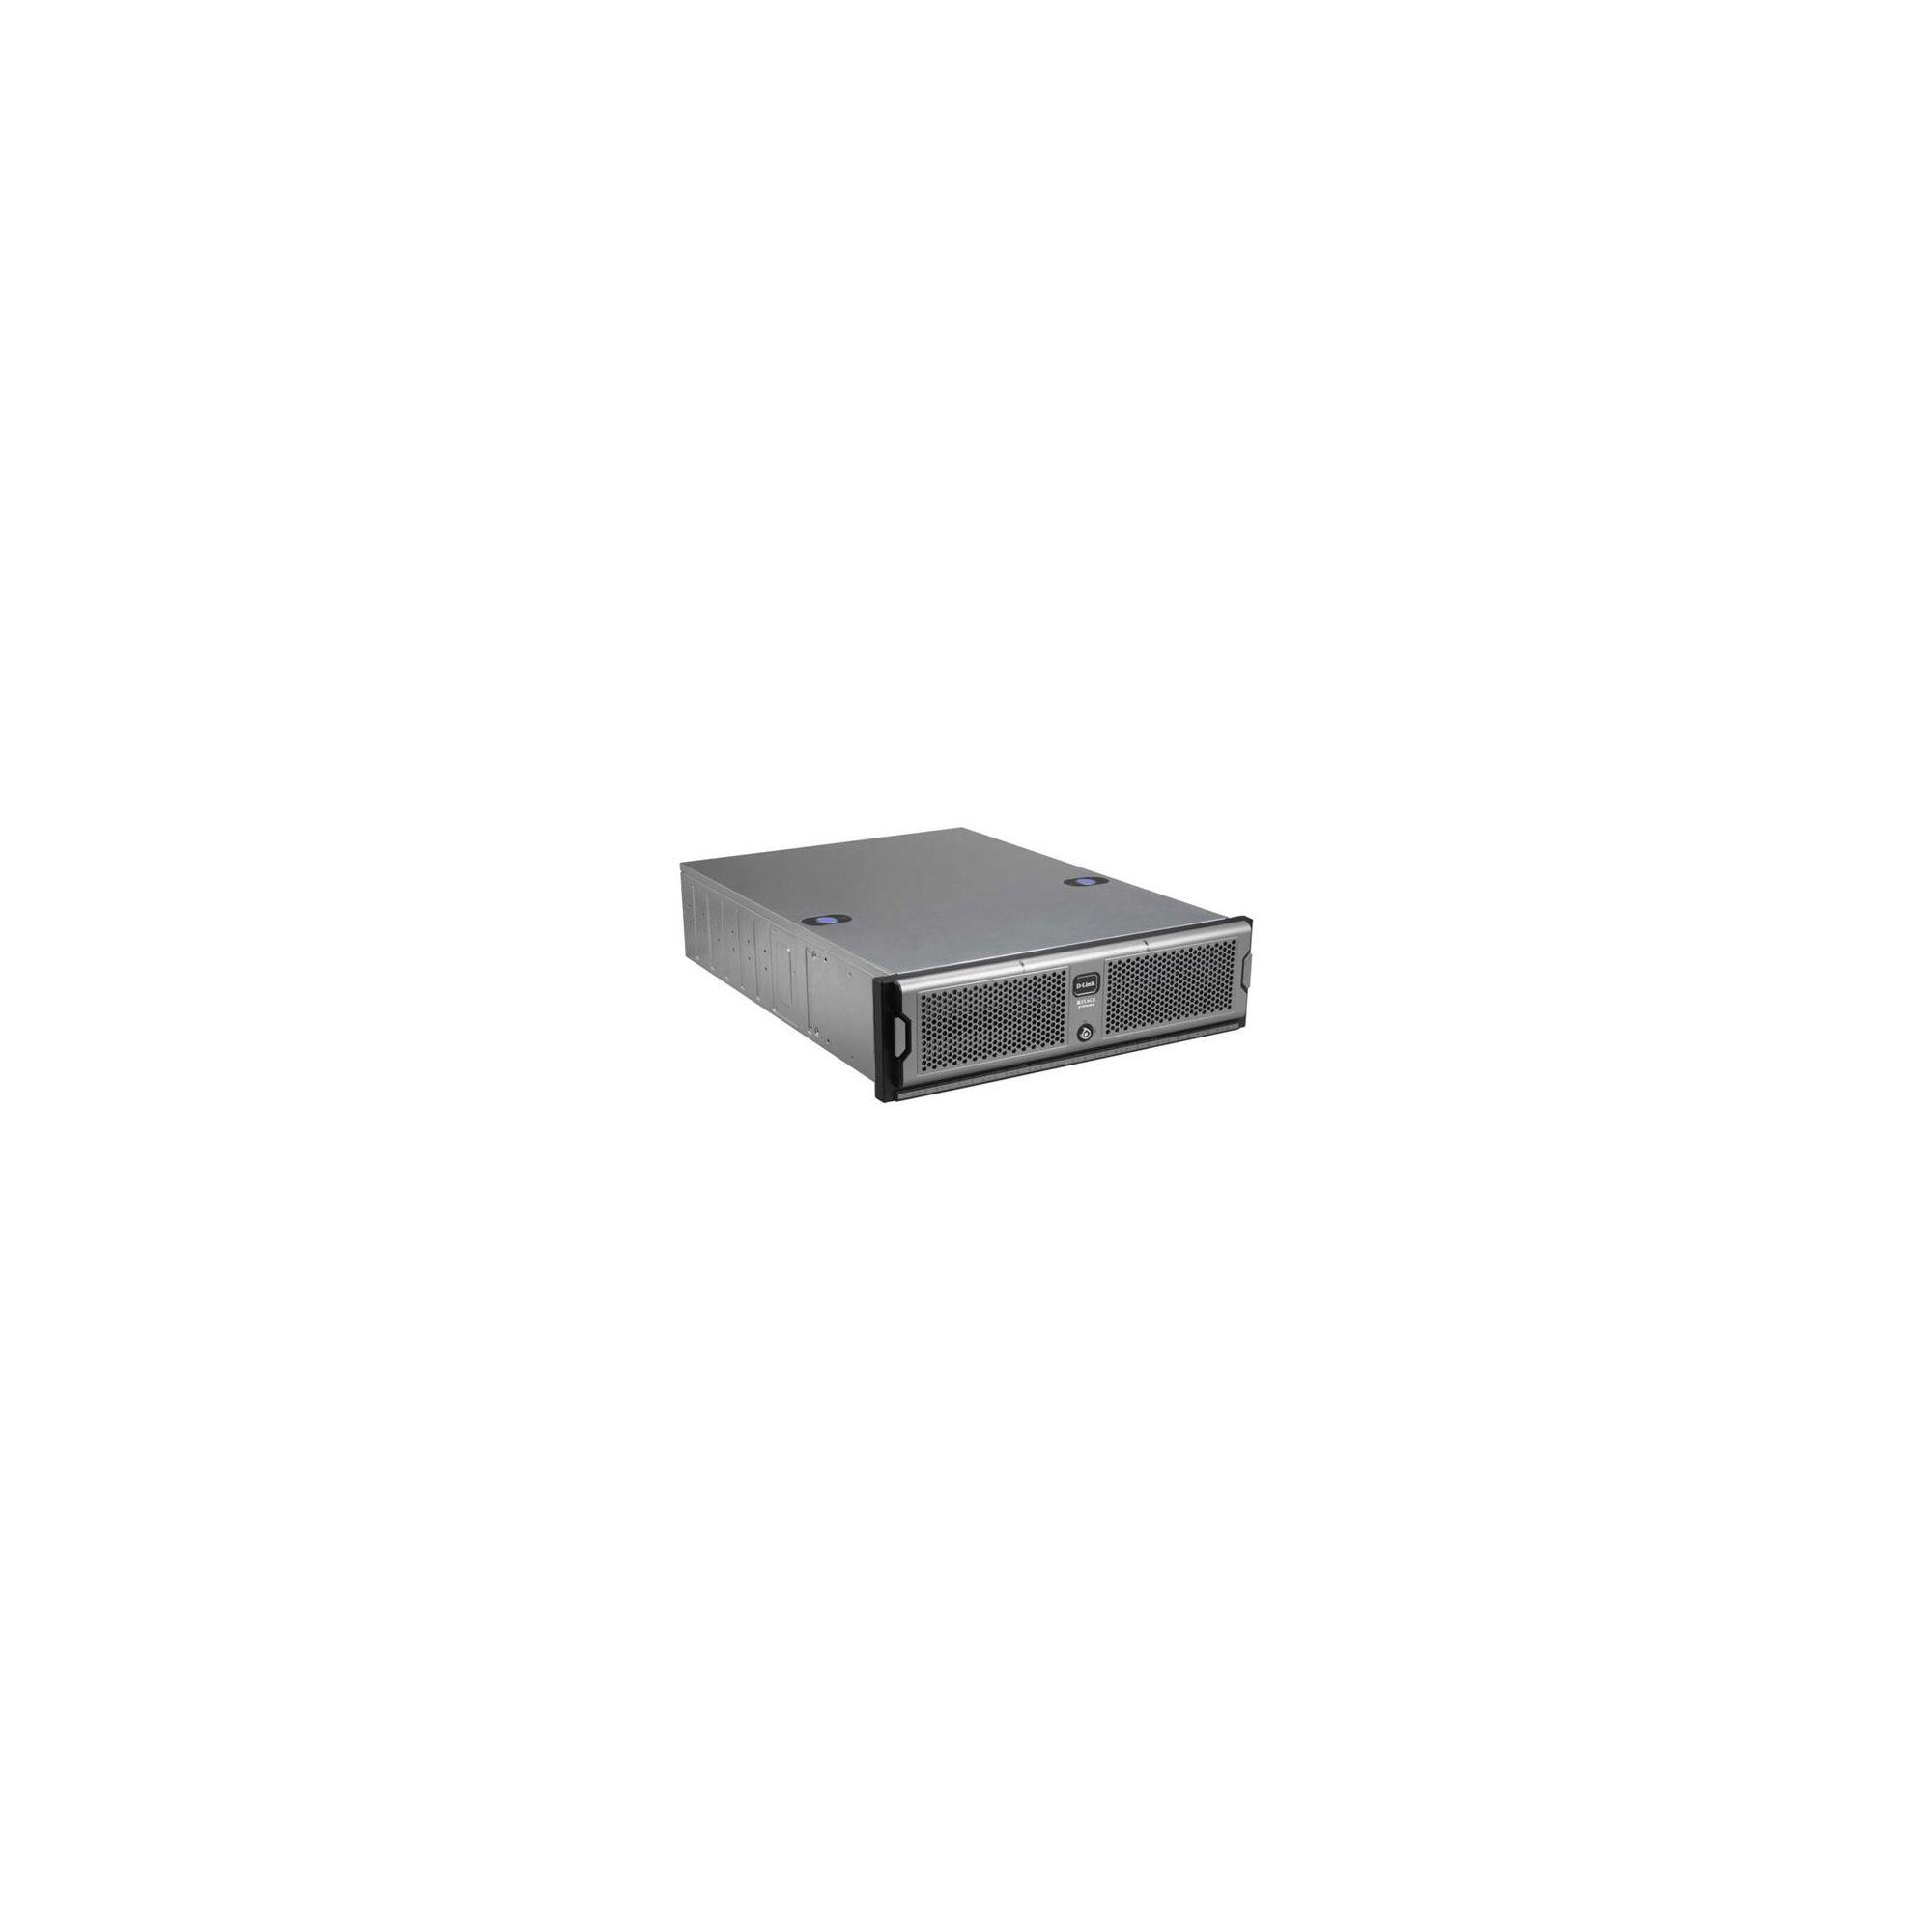 D-Link DSN-3200-10 15-Bay iSCSI SAN Array at Tesco Direct